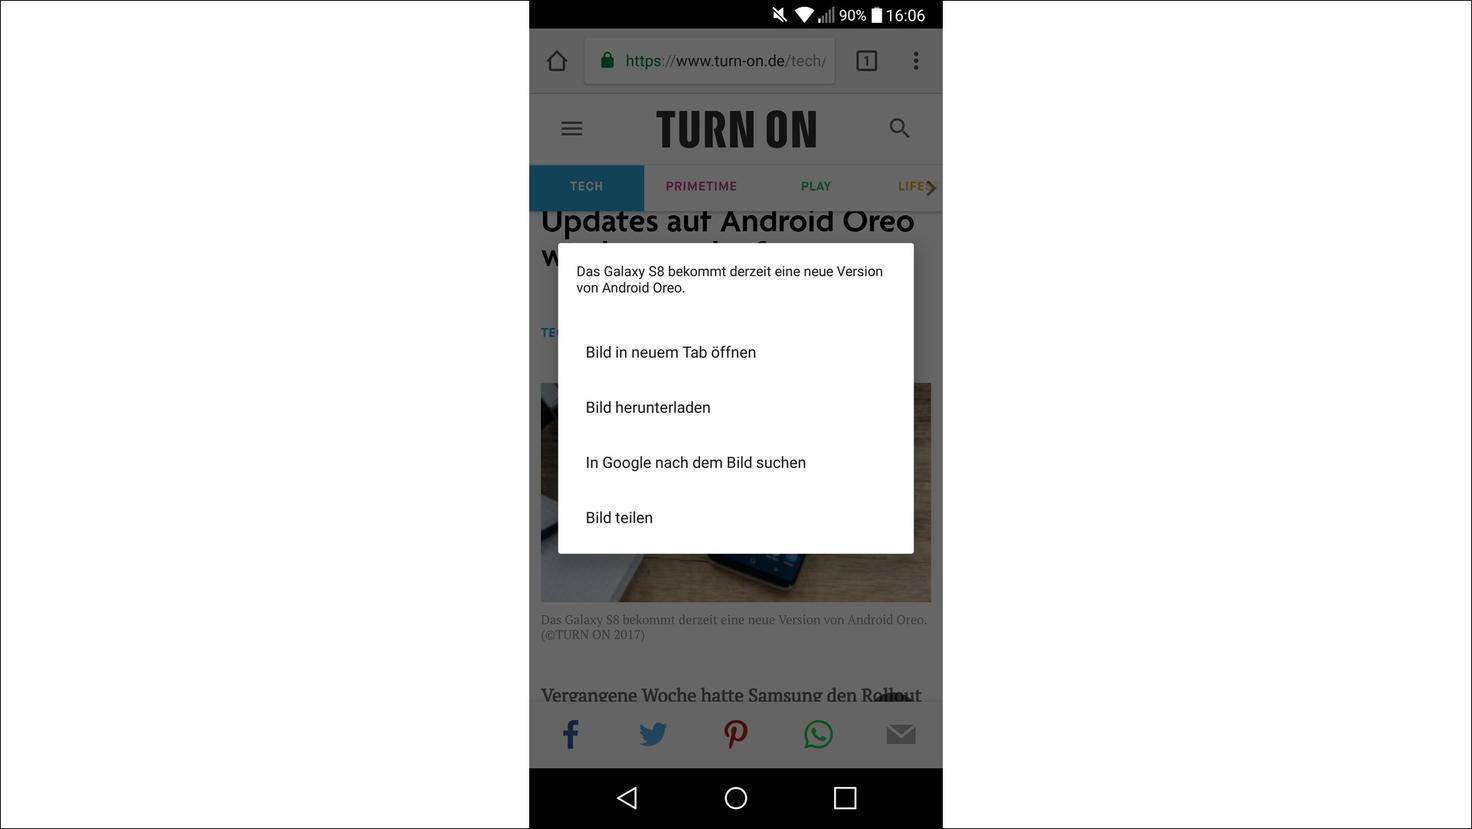 Bildersuche-Smartphone-Google